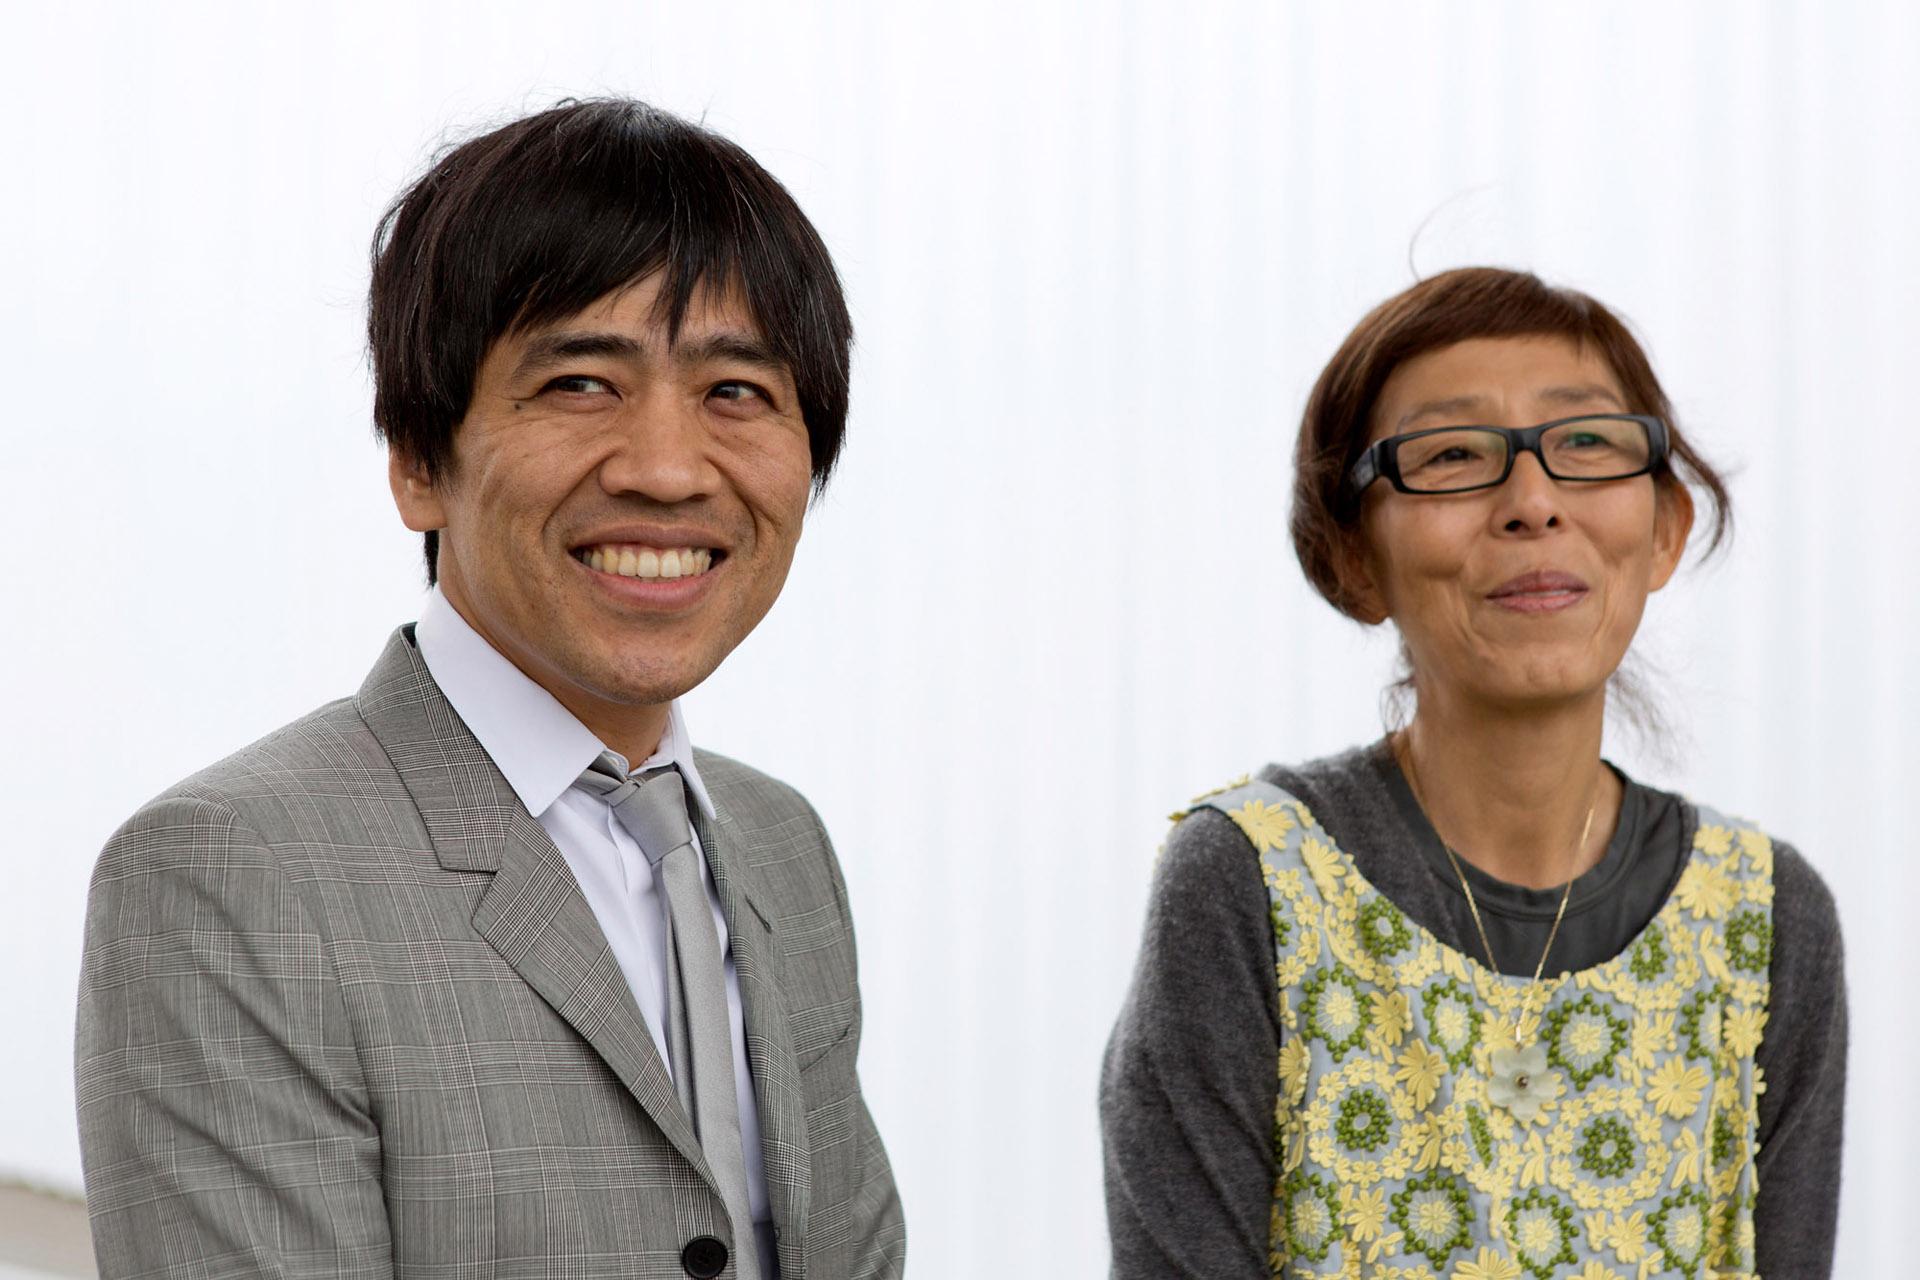 KAZUYO SEJIMA E RYUE NISHIZAWA dello studio SANAA